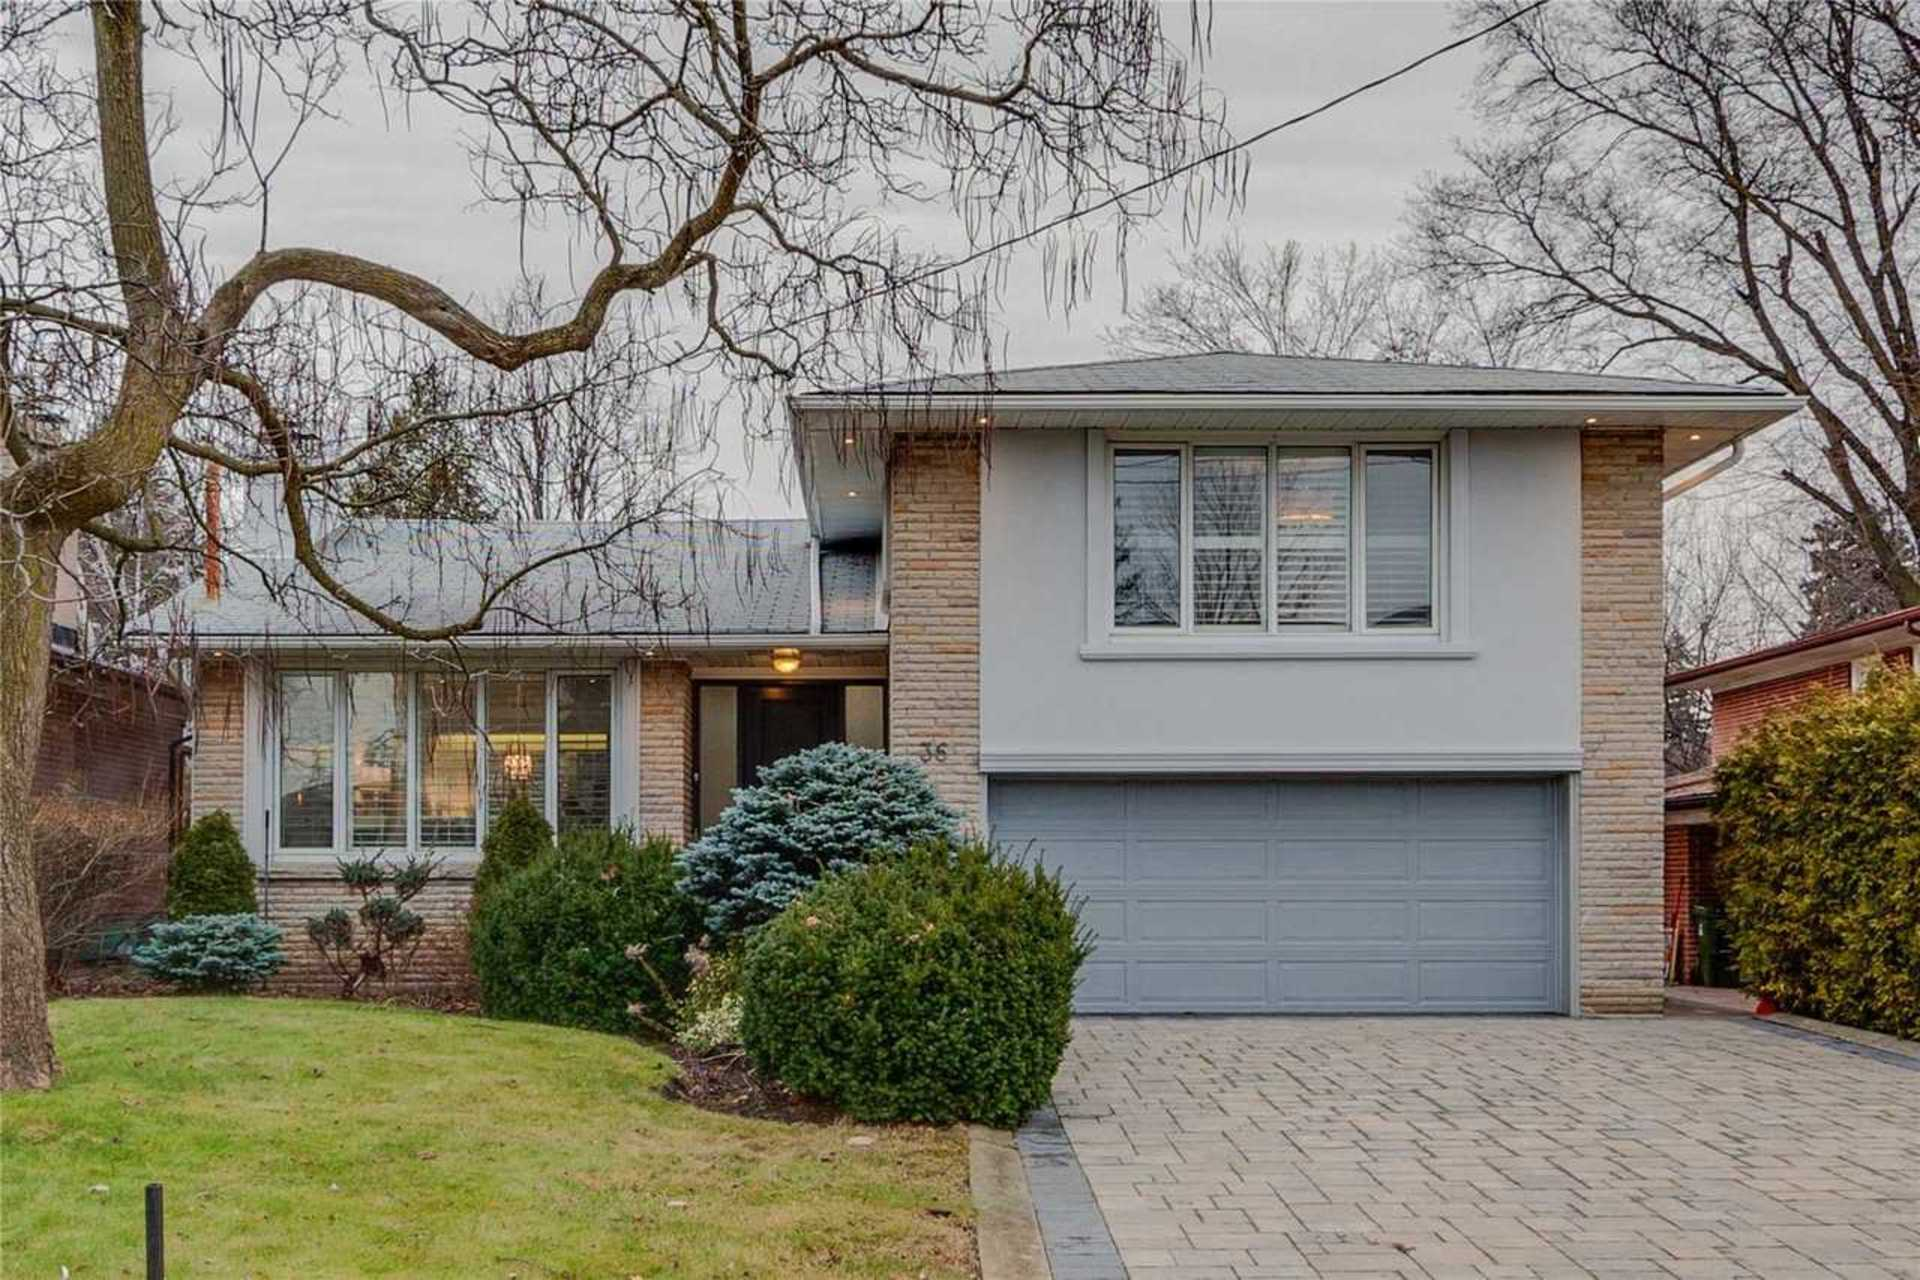 36-bunty-lane-bayview-village-toronto-01 at 36 Bunty Lane, Bayview Village, Toronto